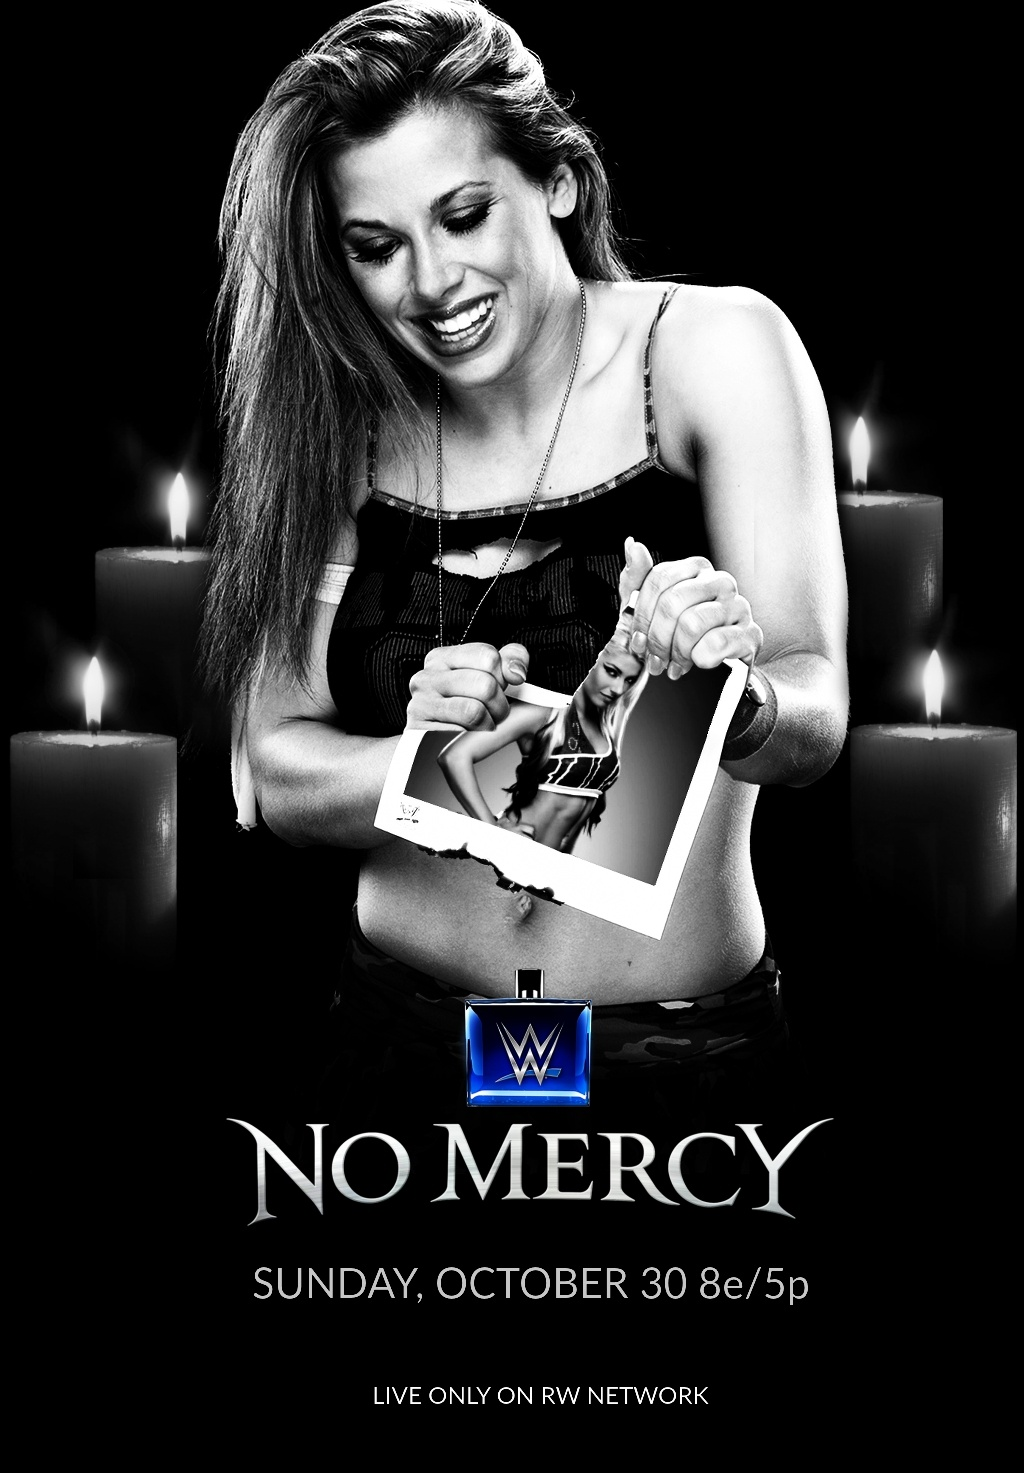 Revolution Wrestling: REVOLUTION WRESTLING PRESENTS: NO MERCY